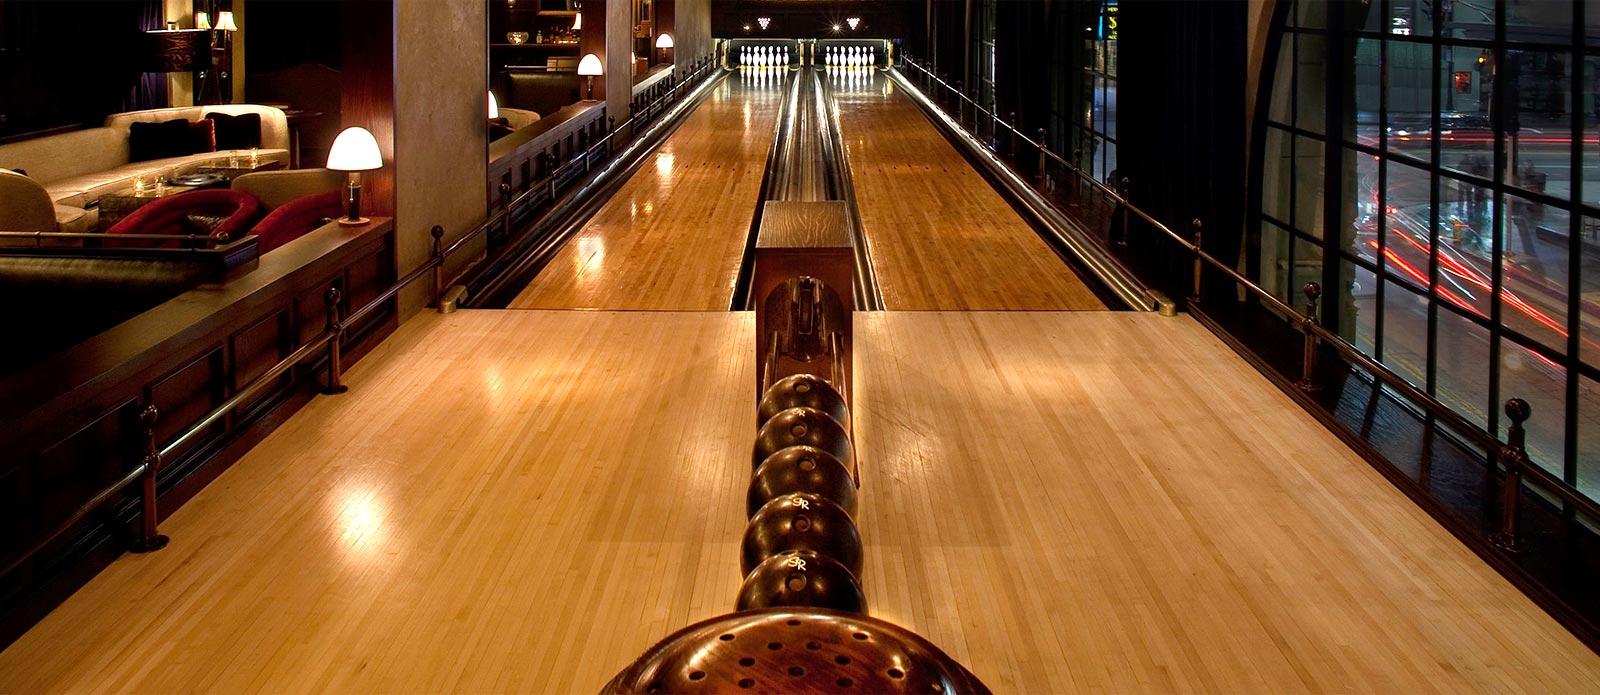 Spare Room Bowling Club Season Xix Tickets Mon Sep 26